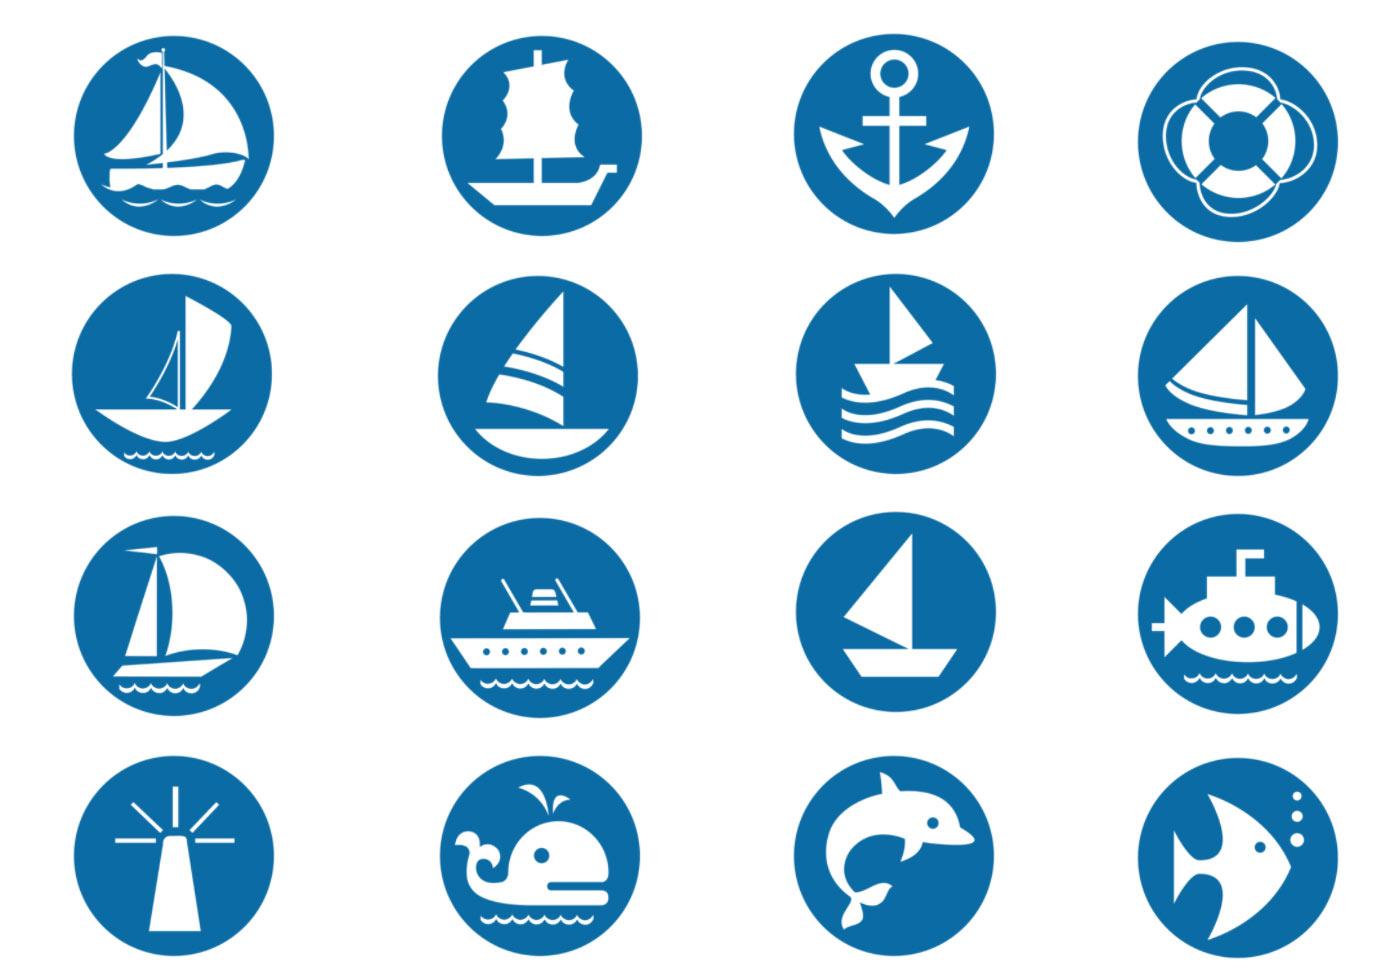 Nautical Symbols And Meanings Nautical Brush ...